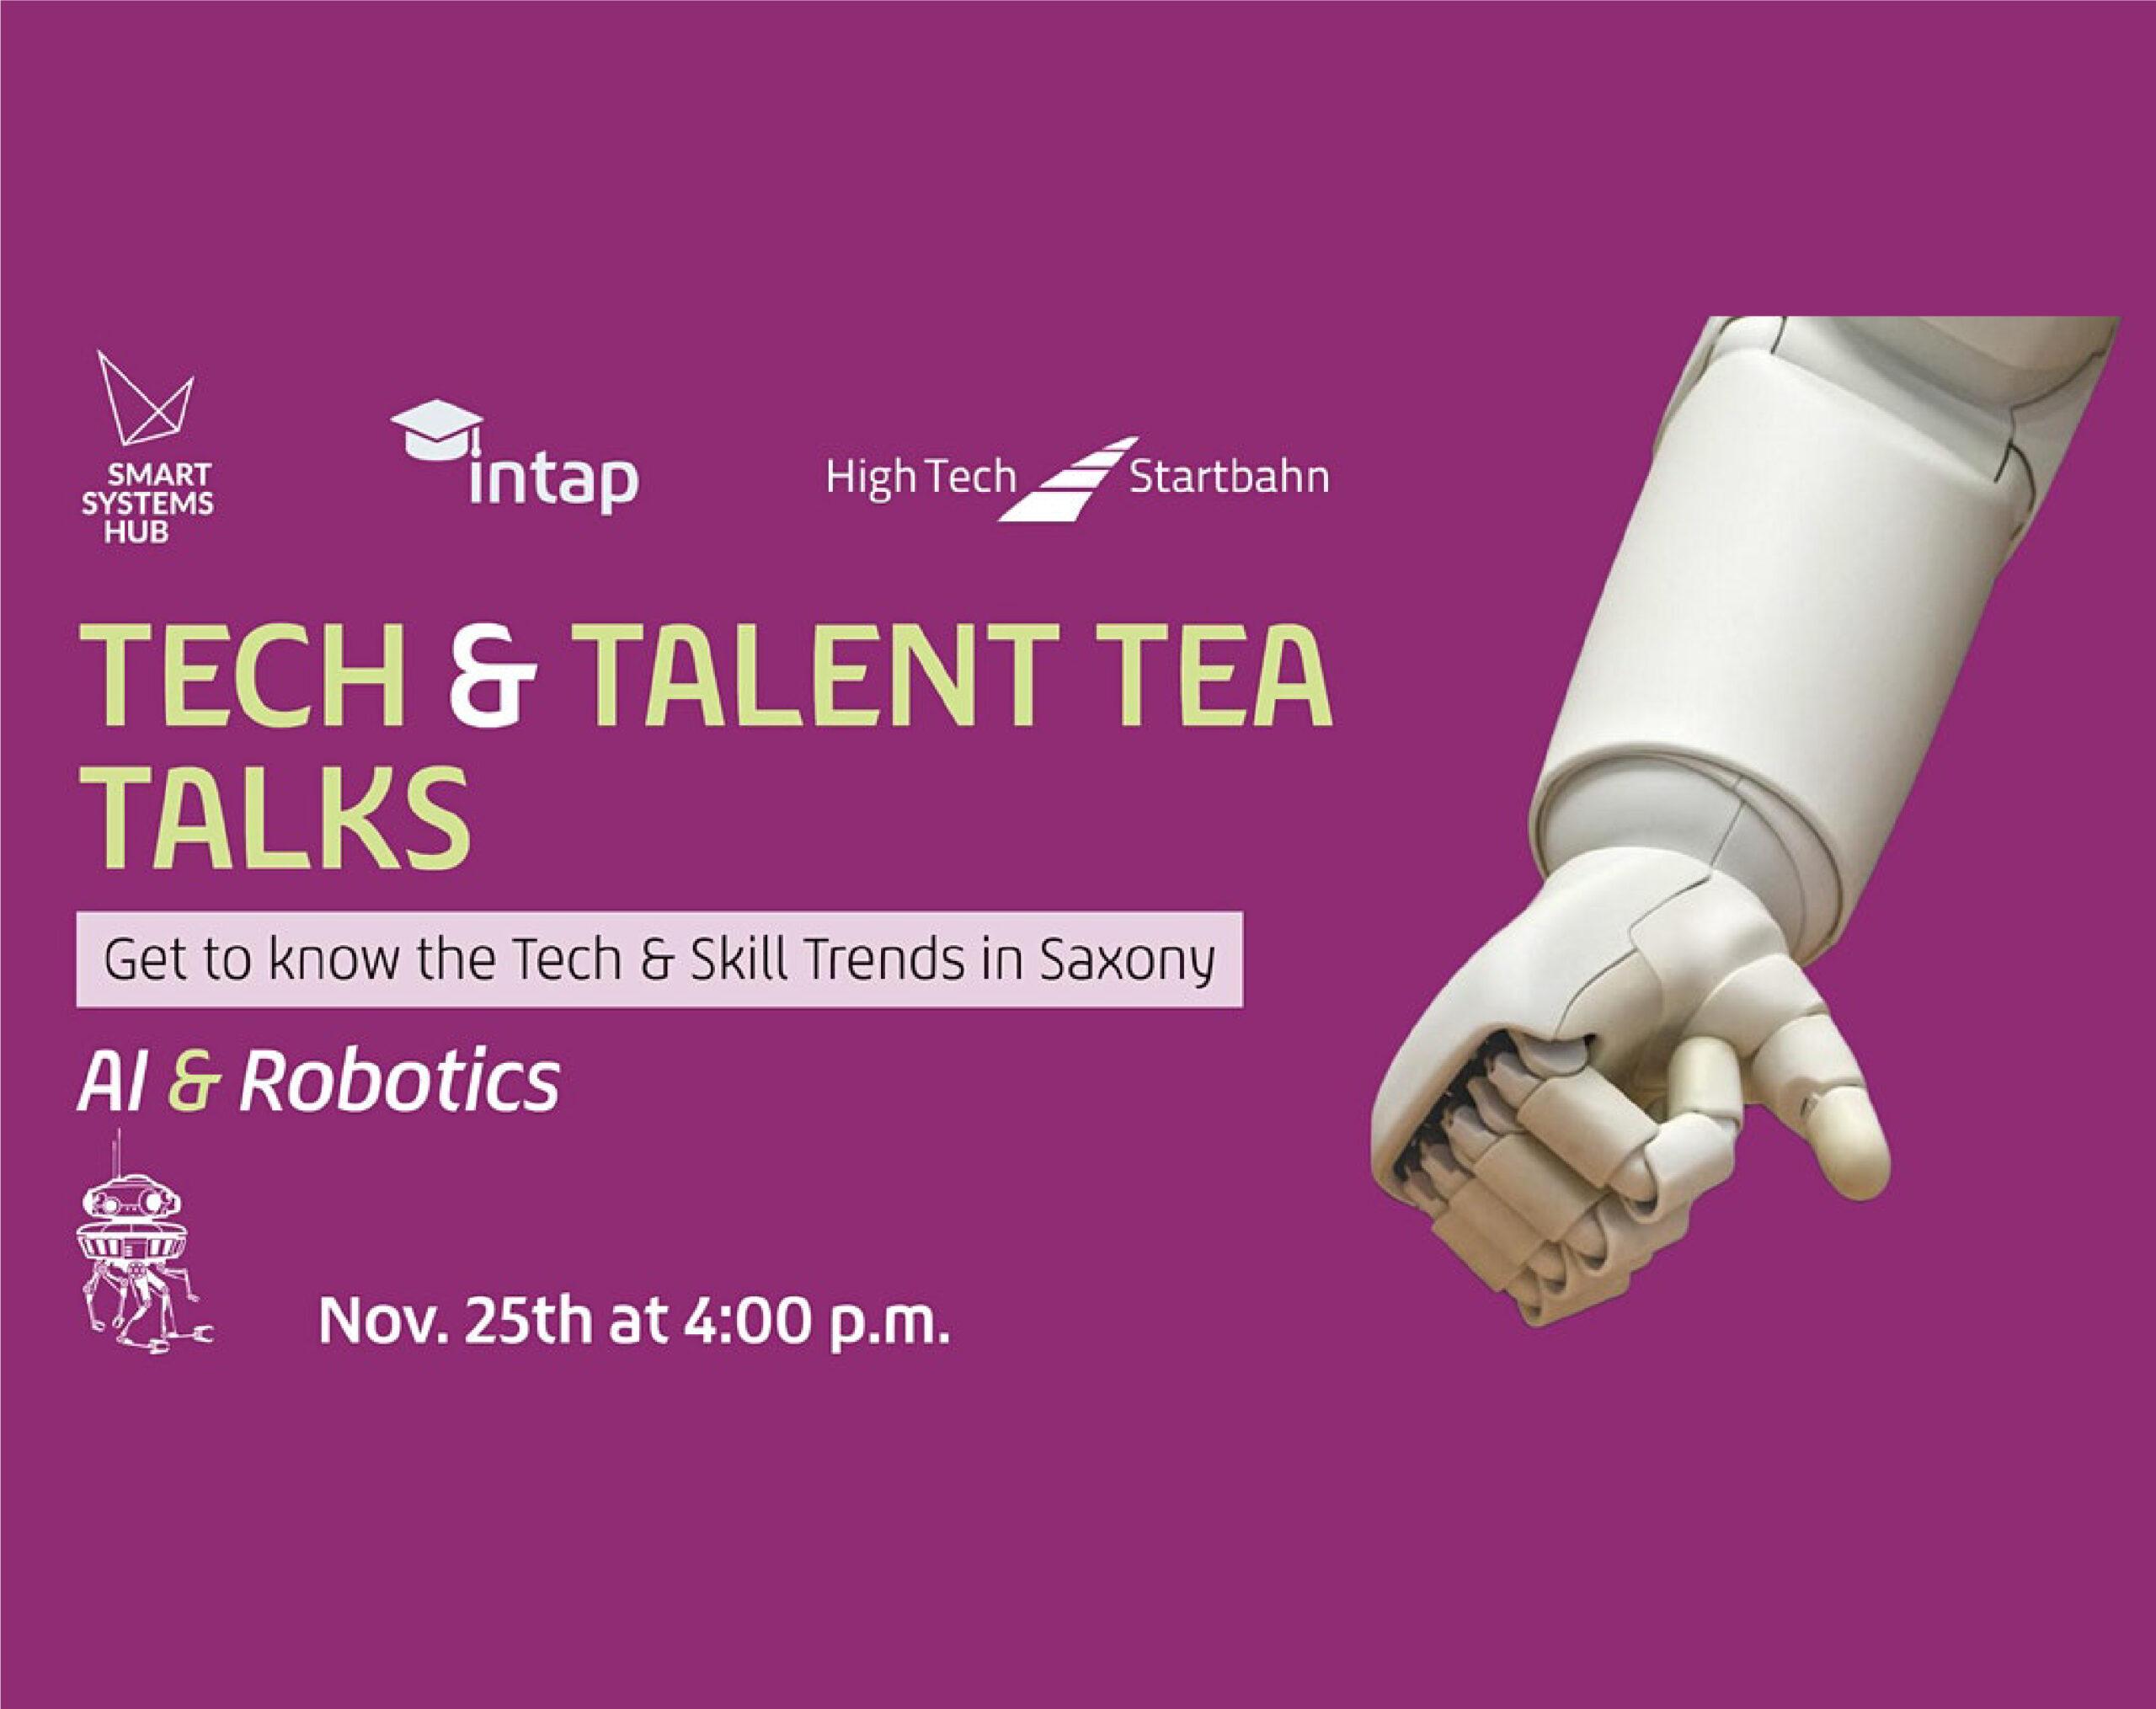 "PowerON's CEO on the panel ""Tech & Talent Tea Talks: AI & Robotics in Saxon Industry"", November 26th."